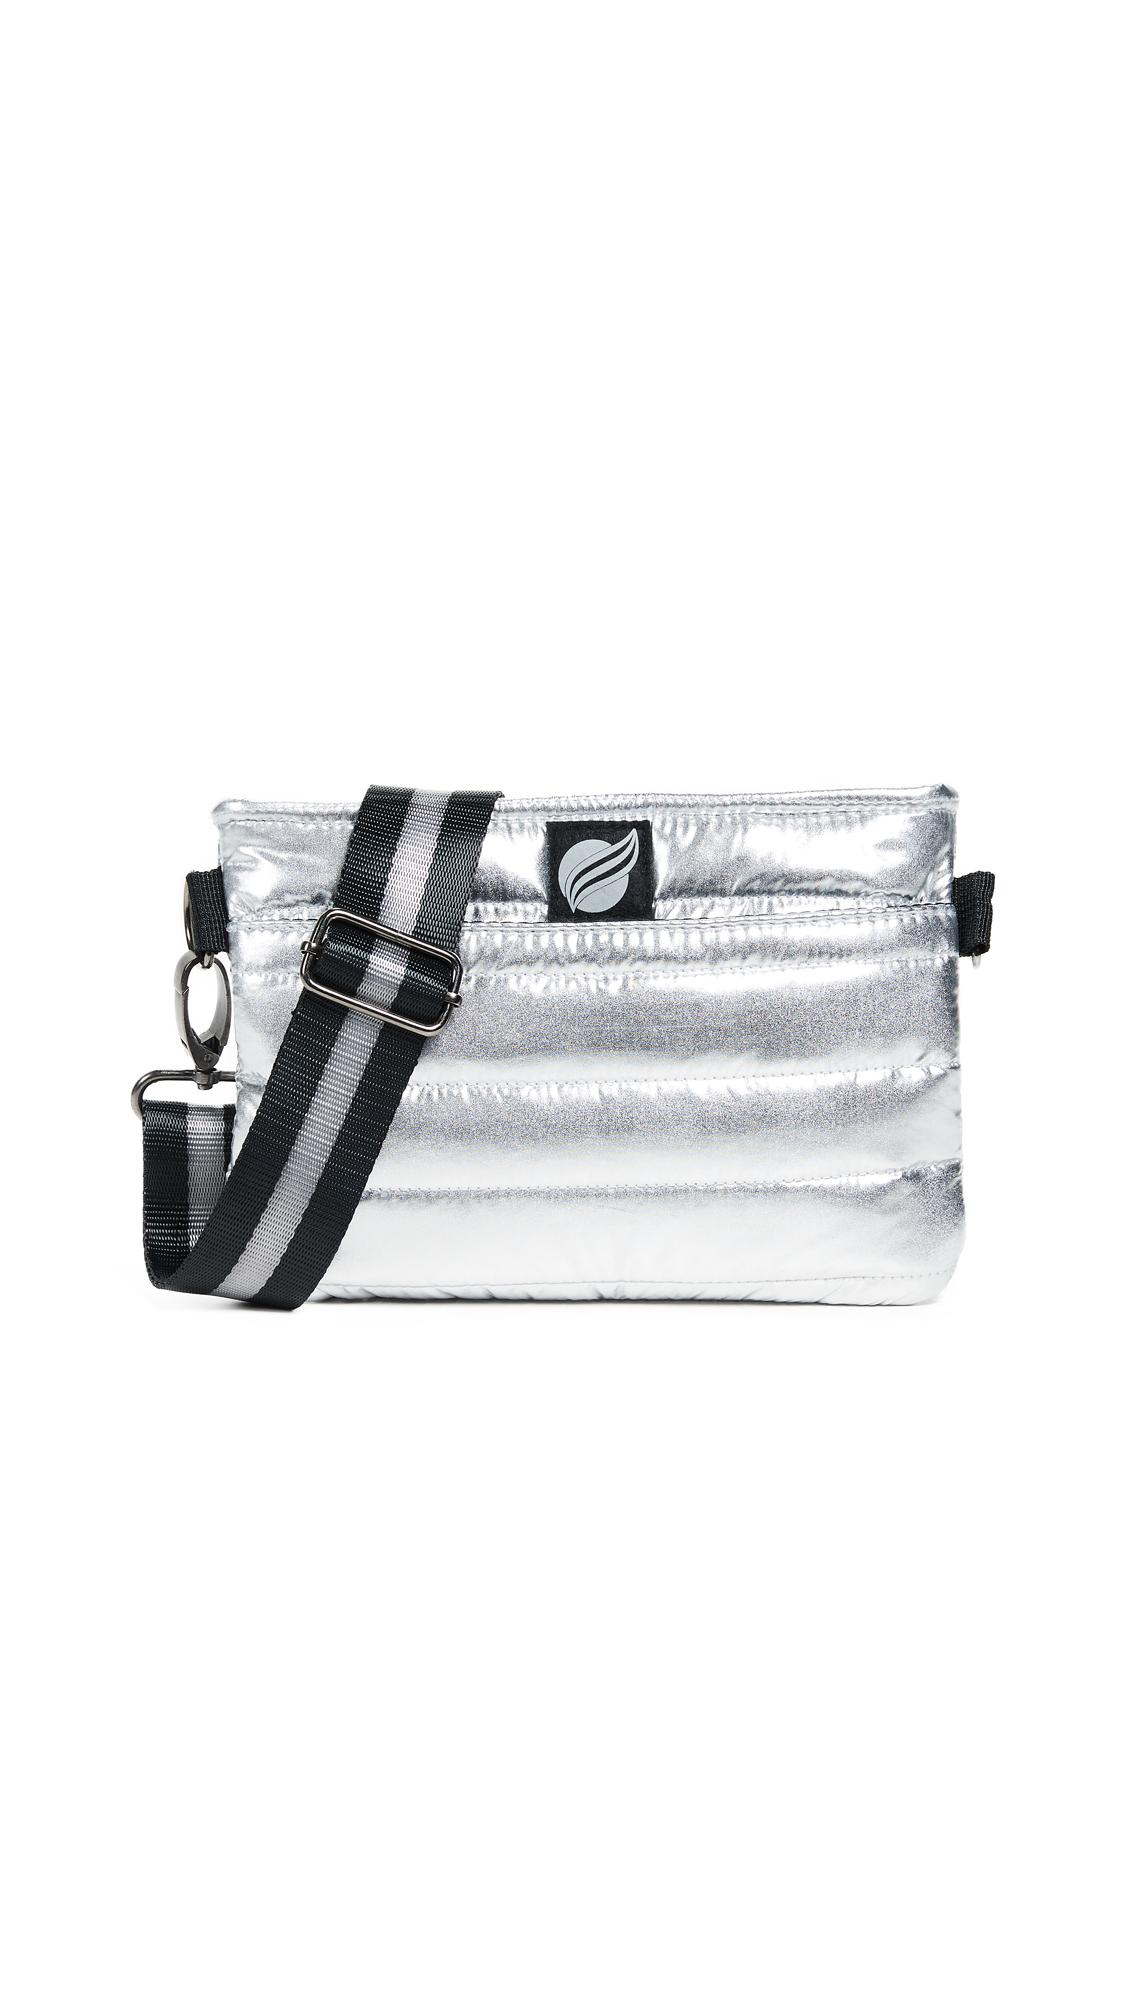 THINK ROYLN Convertible Belt Cross Body Bag in Silver